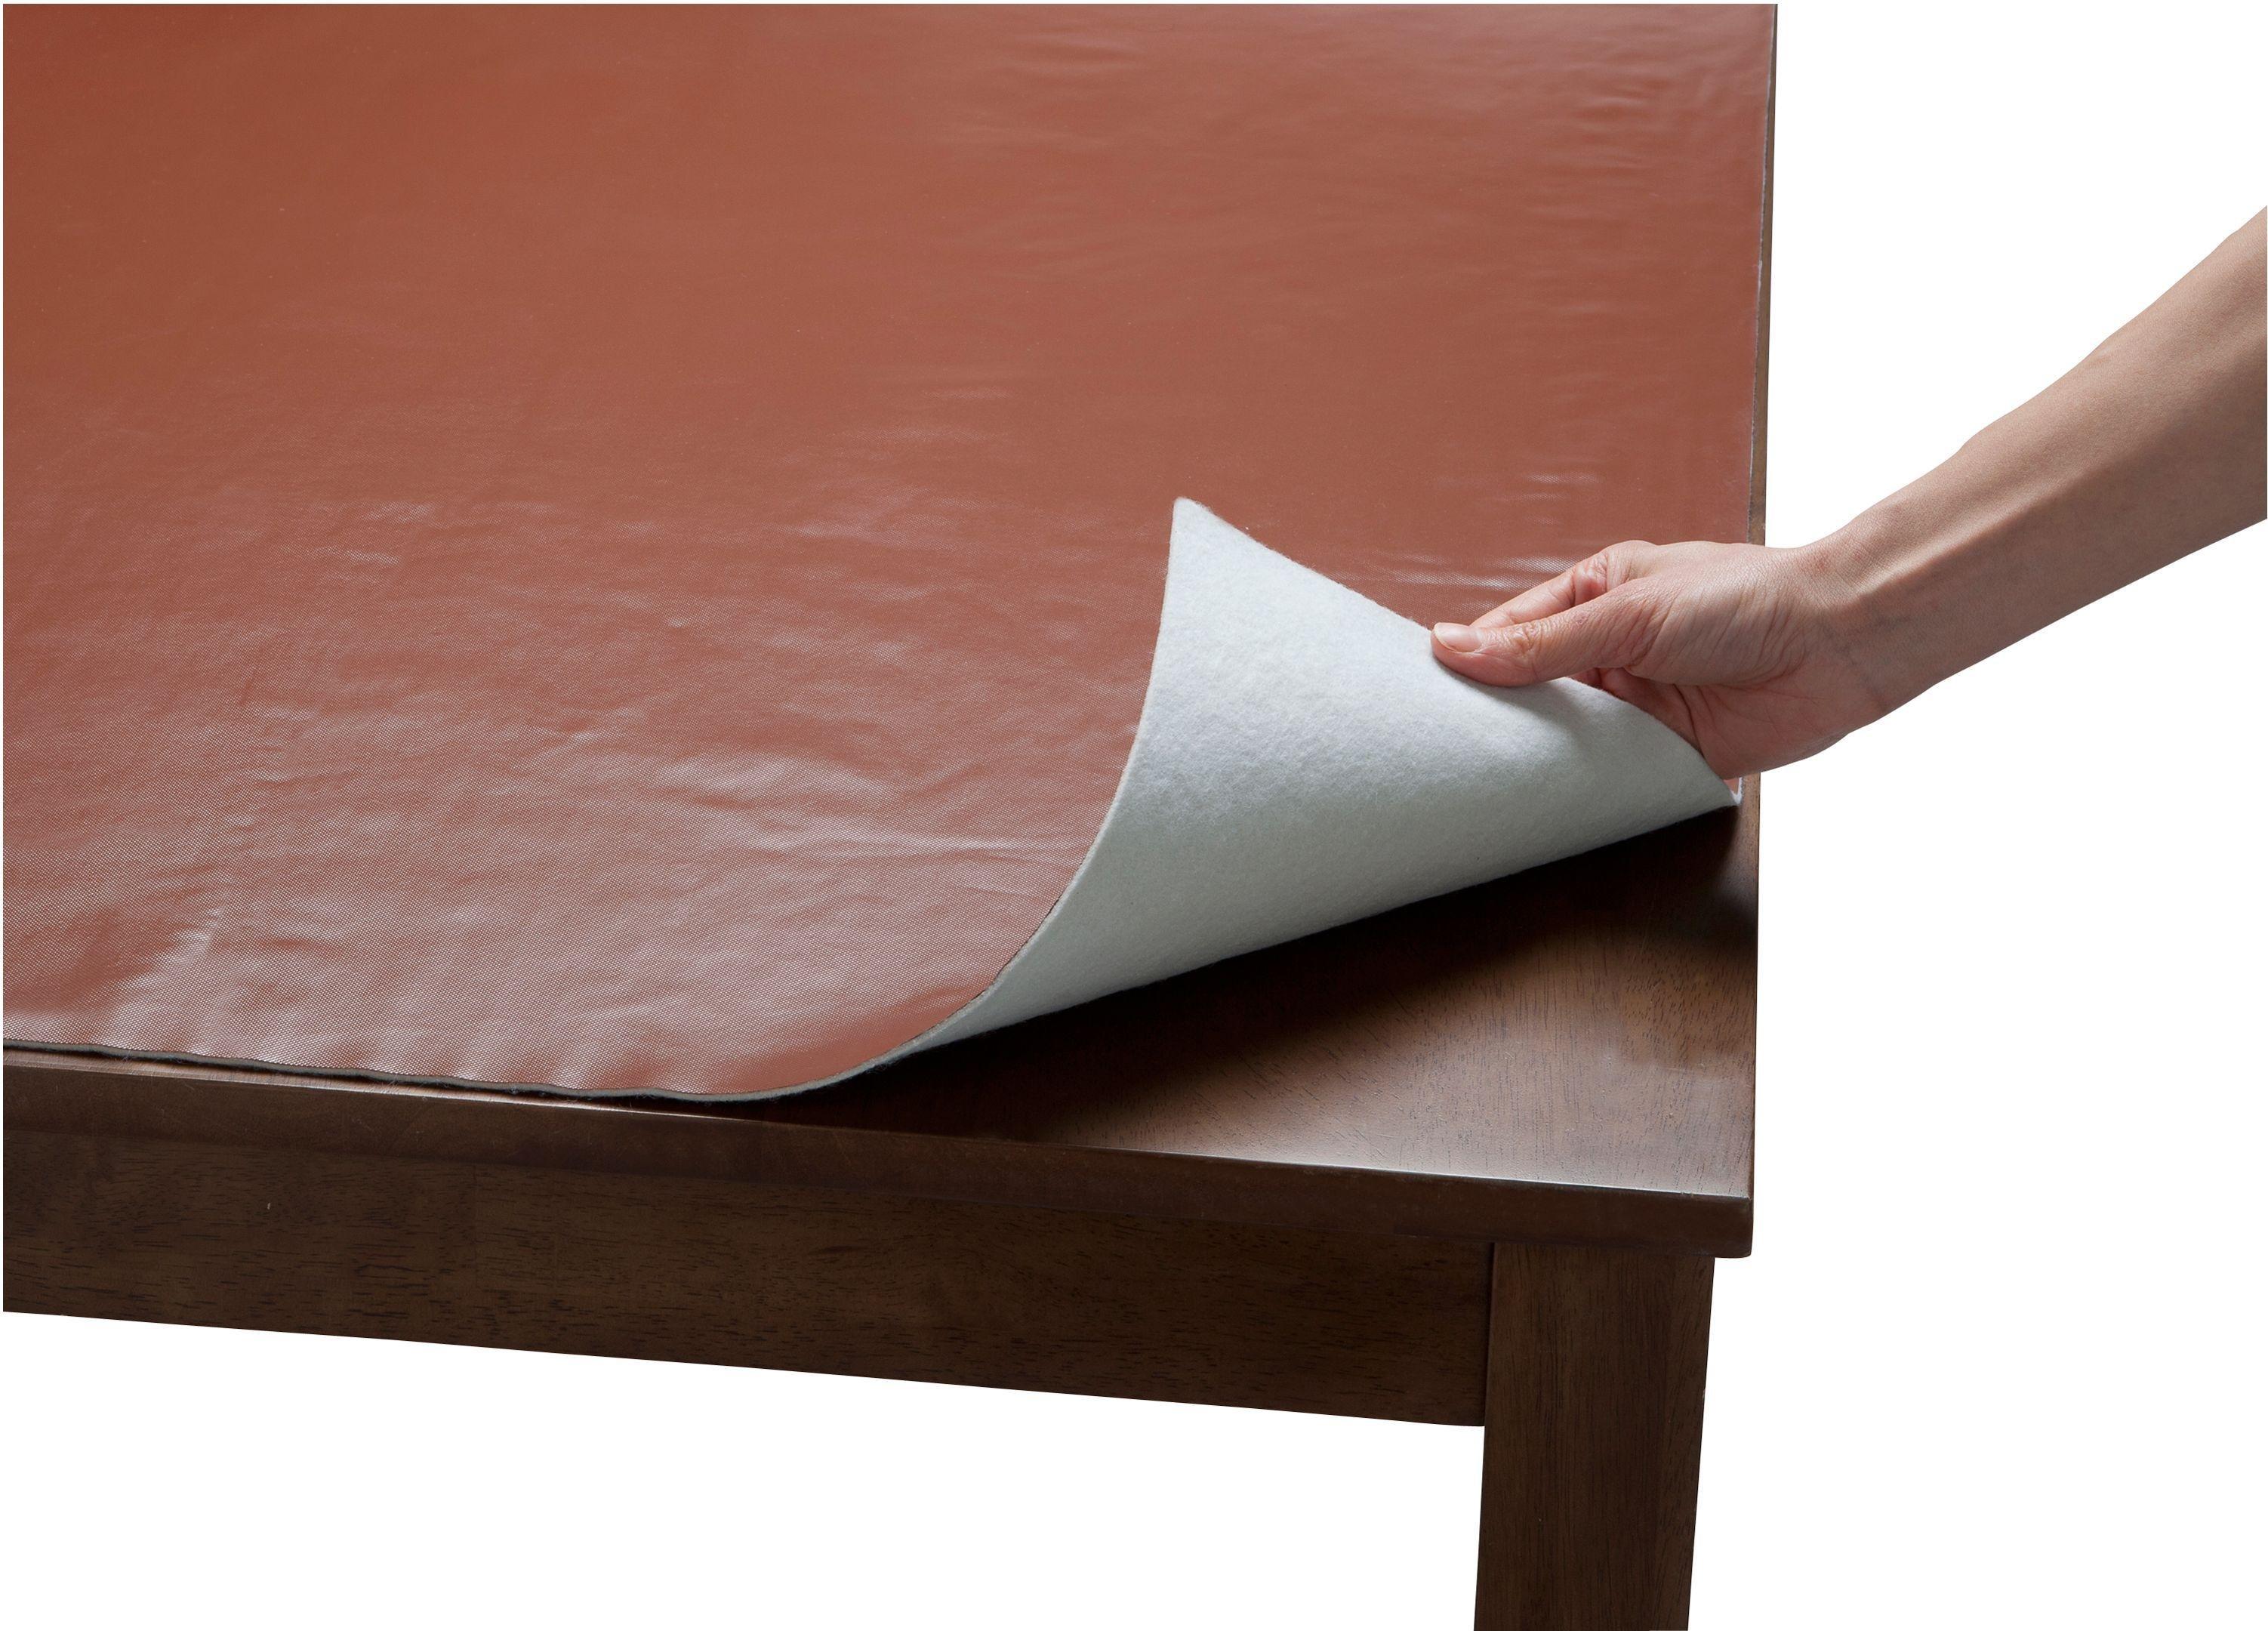 Buy HOME Felt Table Protector 105 x 230cm at Argoscouk  : 1220250RZ001AUC1168189Webampw570amph513 from www.argos.co.uk size 570 x 513 jpeg 23kB